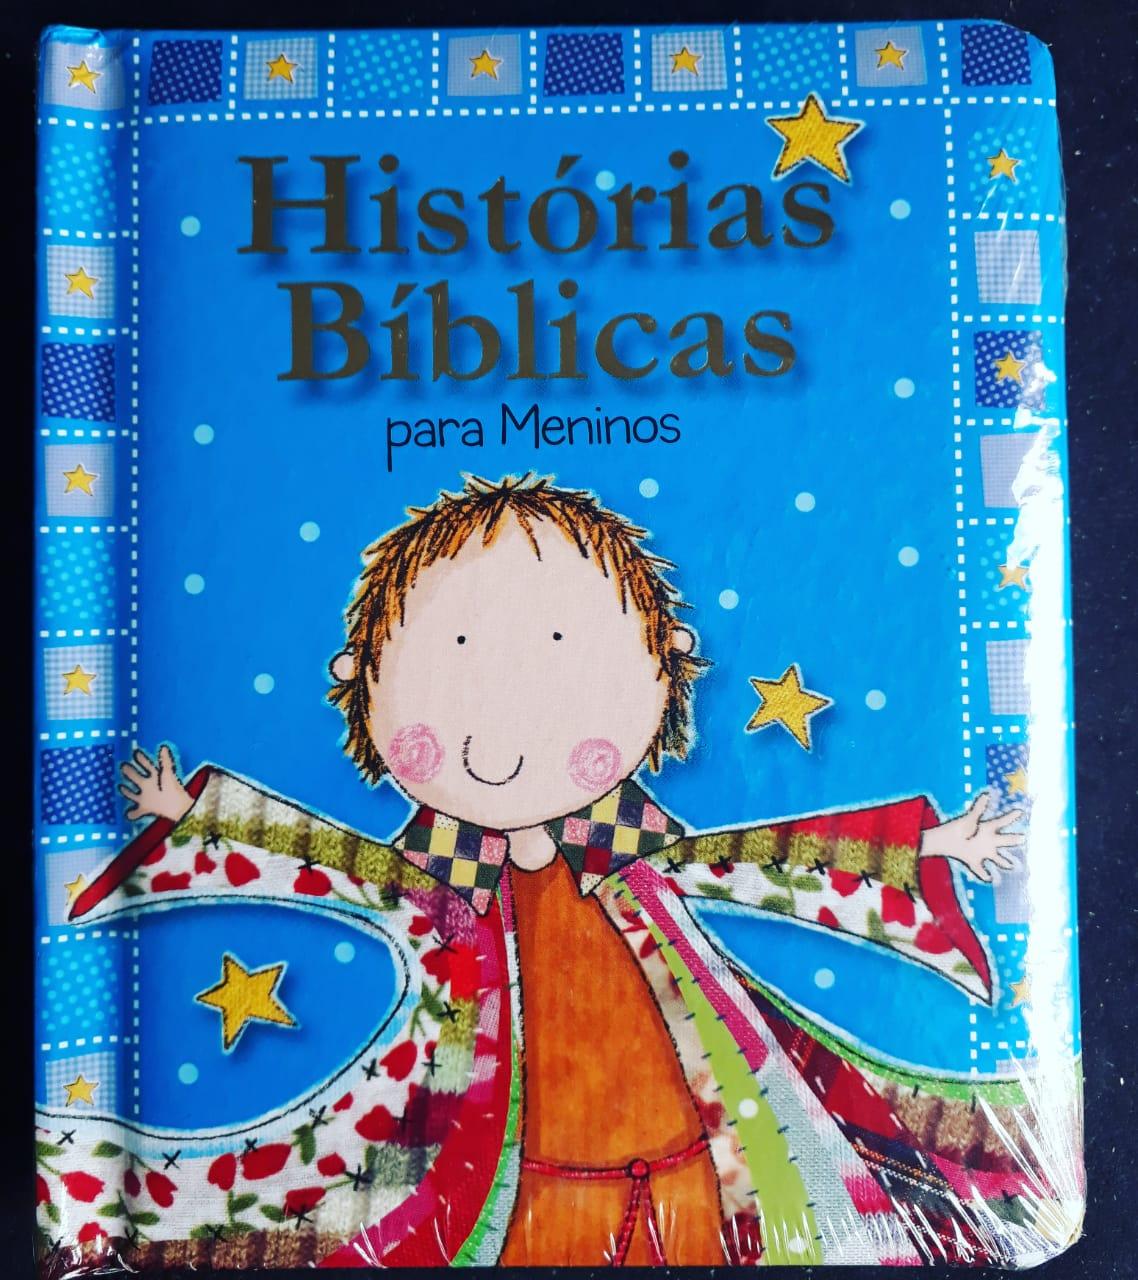 Historias Biblicas para Meninos  - VindVedShop - Distribuidora Catolica